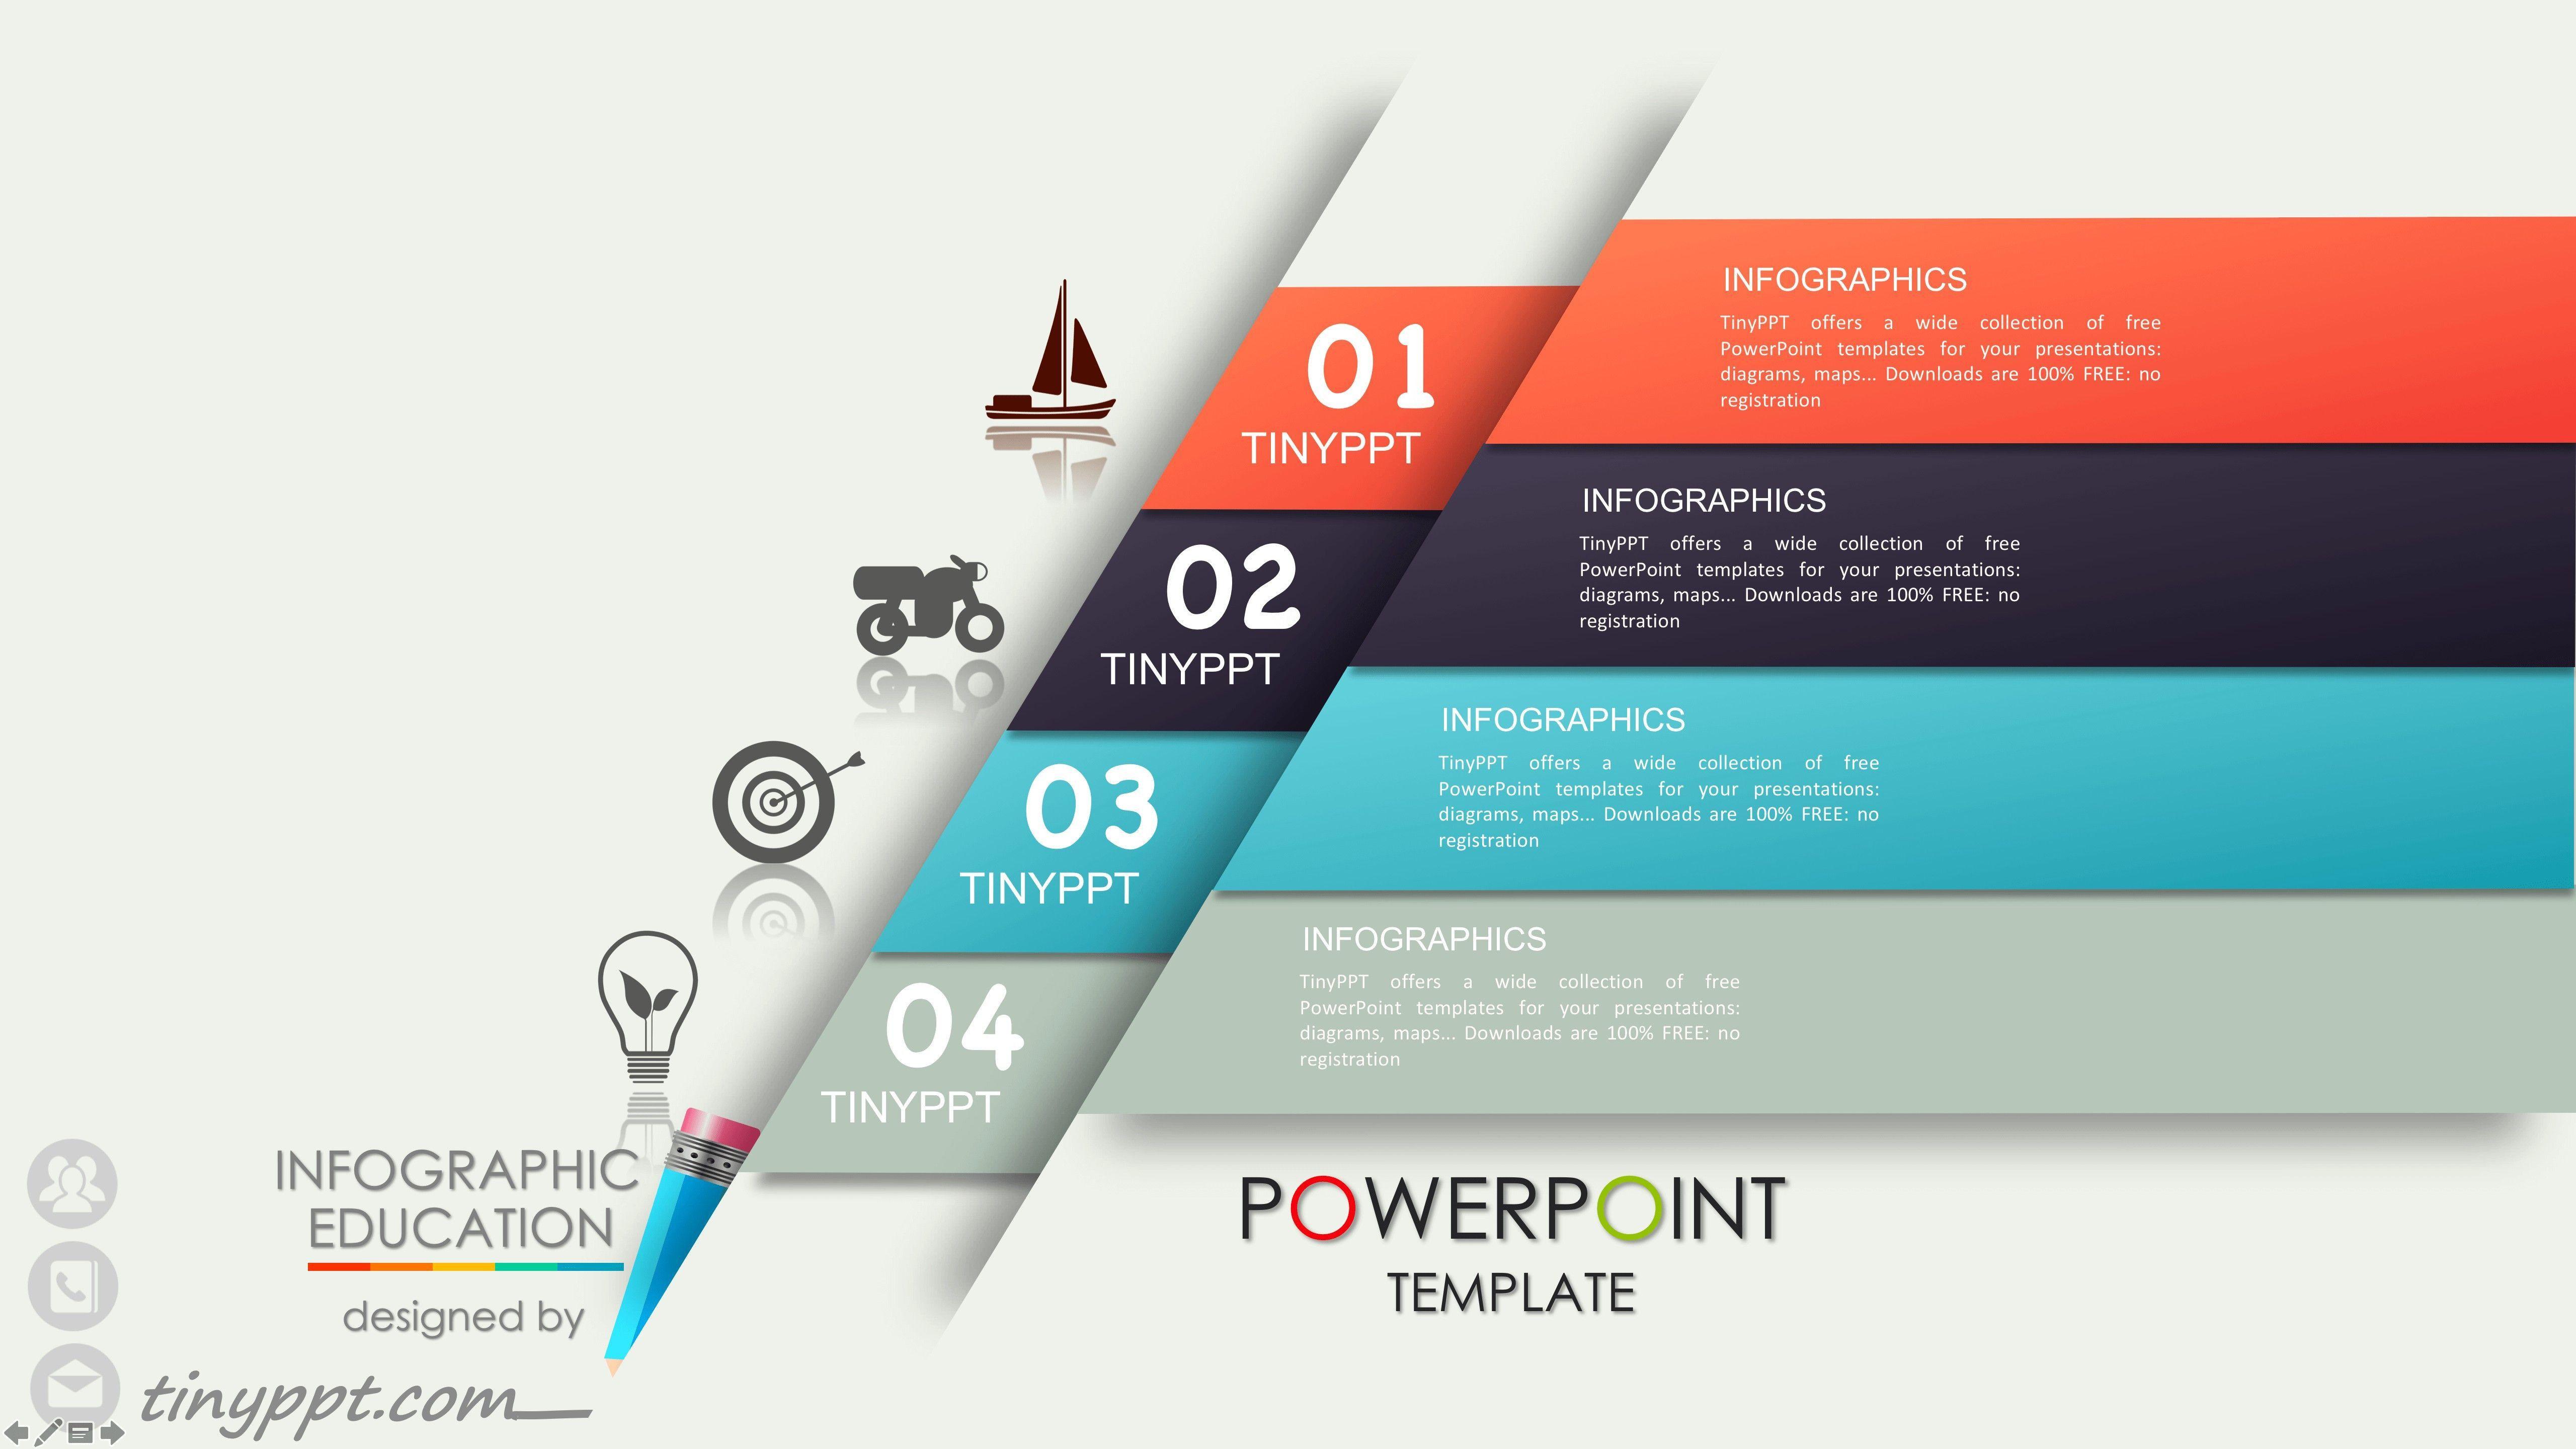 Nursing Powerpoint Presentation Template Fresh Arabic Infographic Collection Powerpoint Background Templates Presentation Template Free Infographic Powerpoint